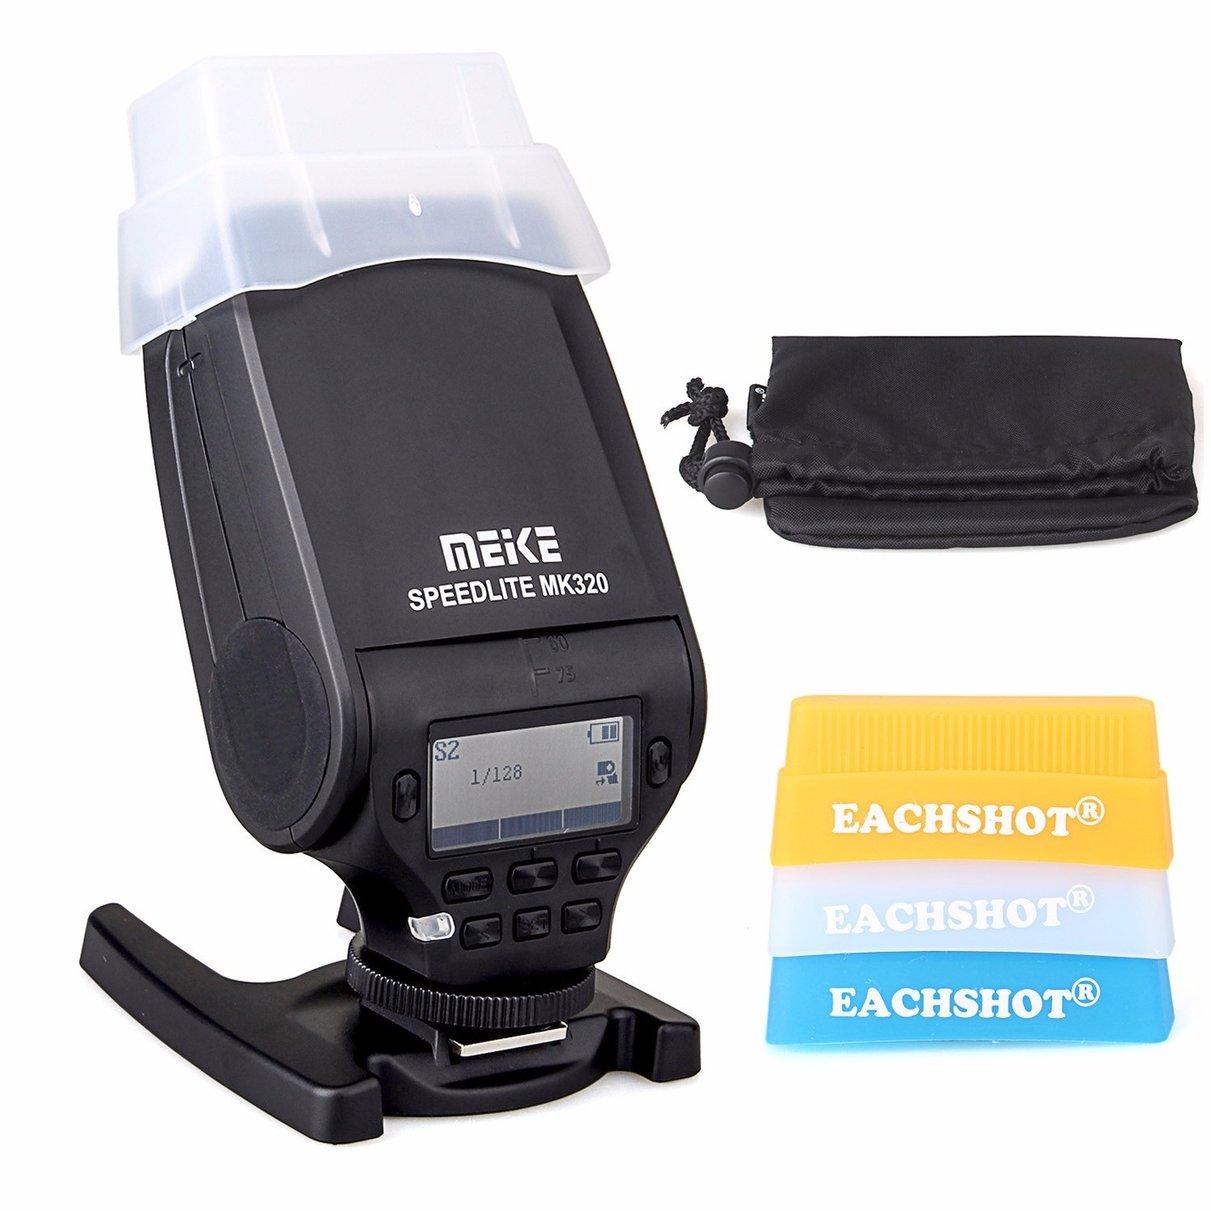 MEK MK-320 I-TTL HSS मास्टर फ्लैश स्पीडलाइट Nikon D3400 D5300 D7200 D750 के लिए